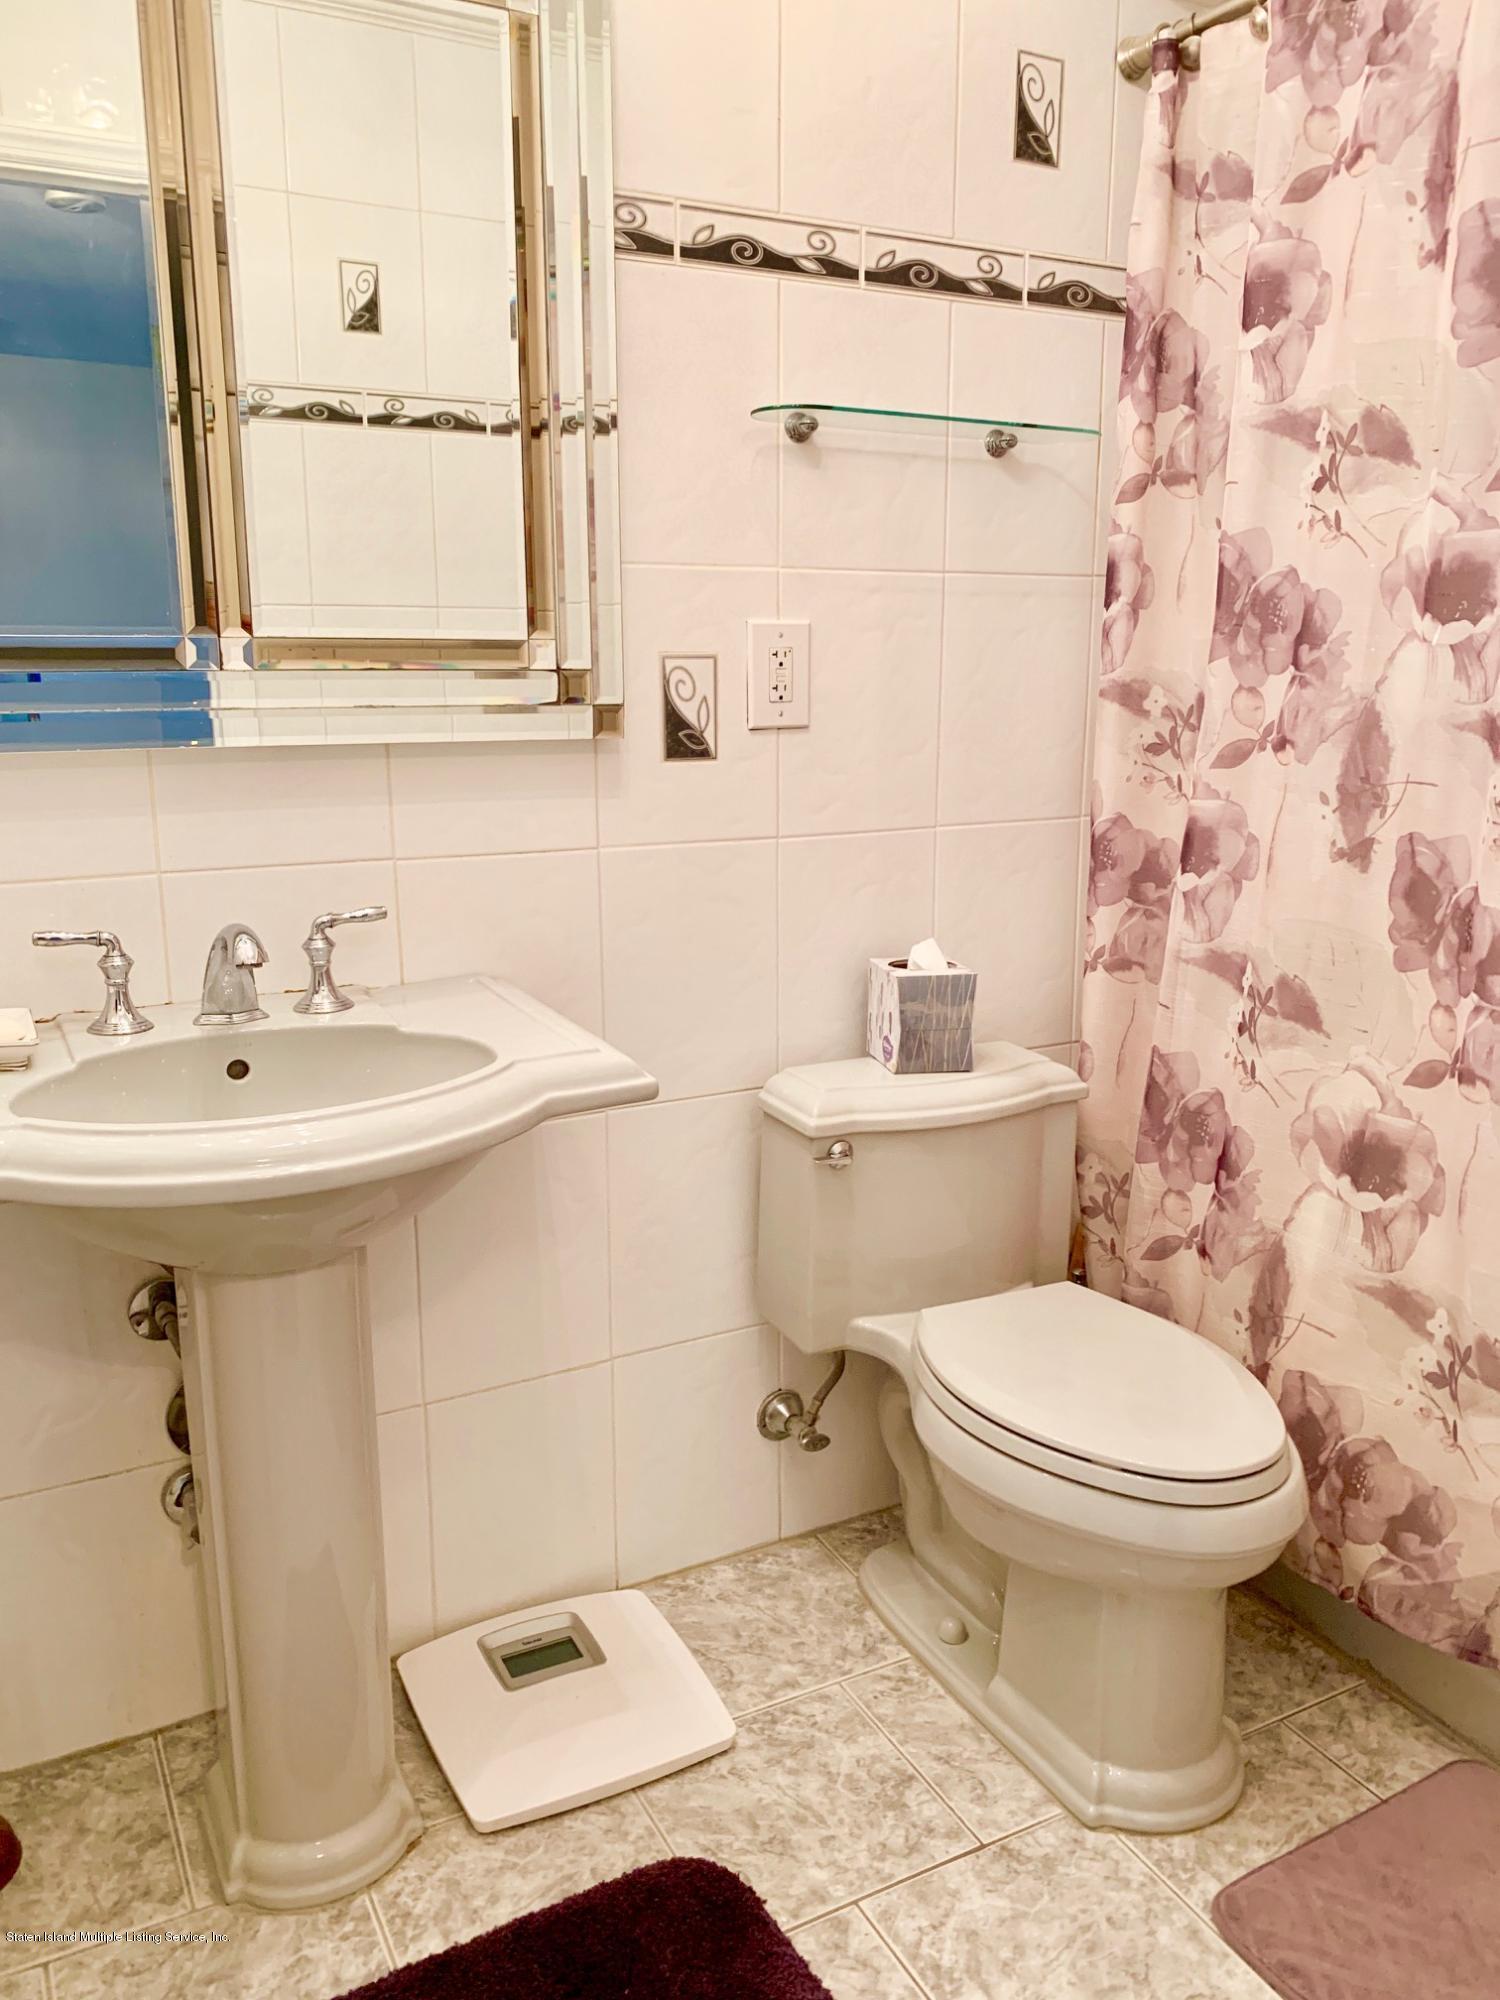 Single Family - Attached 99 Cedar Grove   Staten Island, NY 10306, MLS-1132231-4